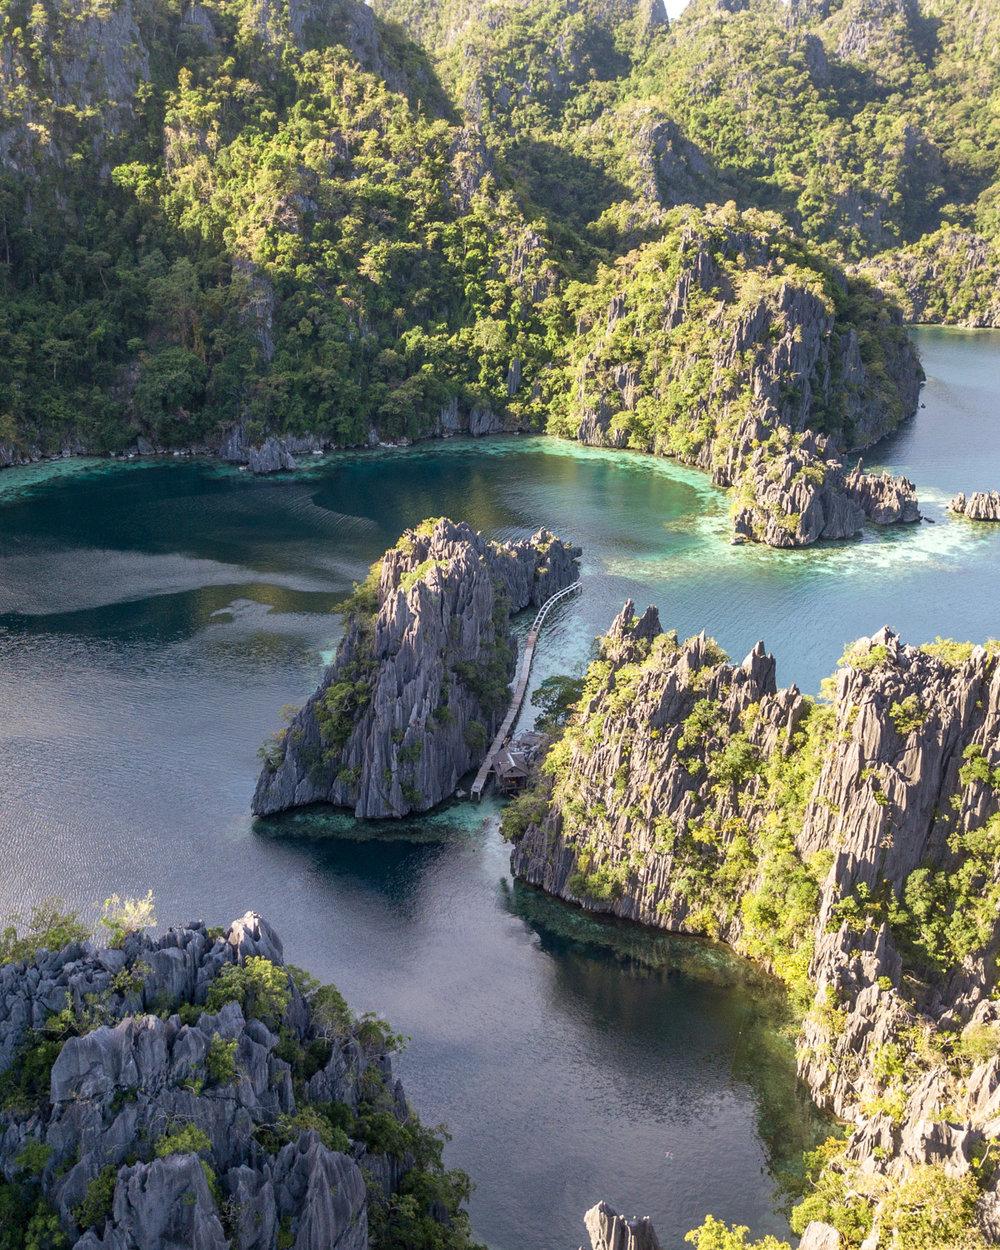 The second lagoon from above - Twin Lagoon, Coron Palawan